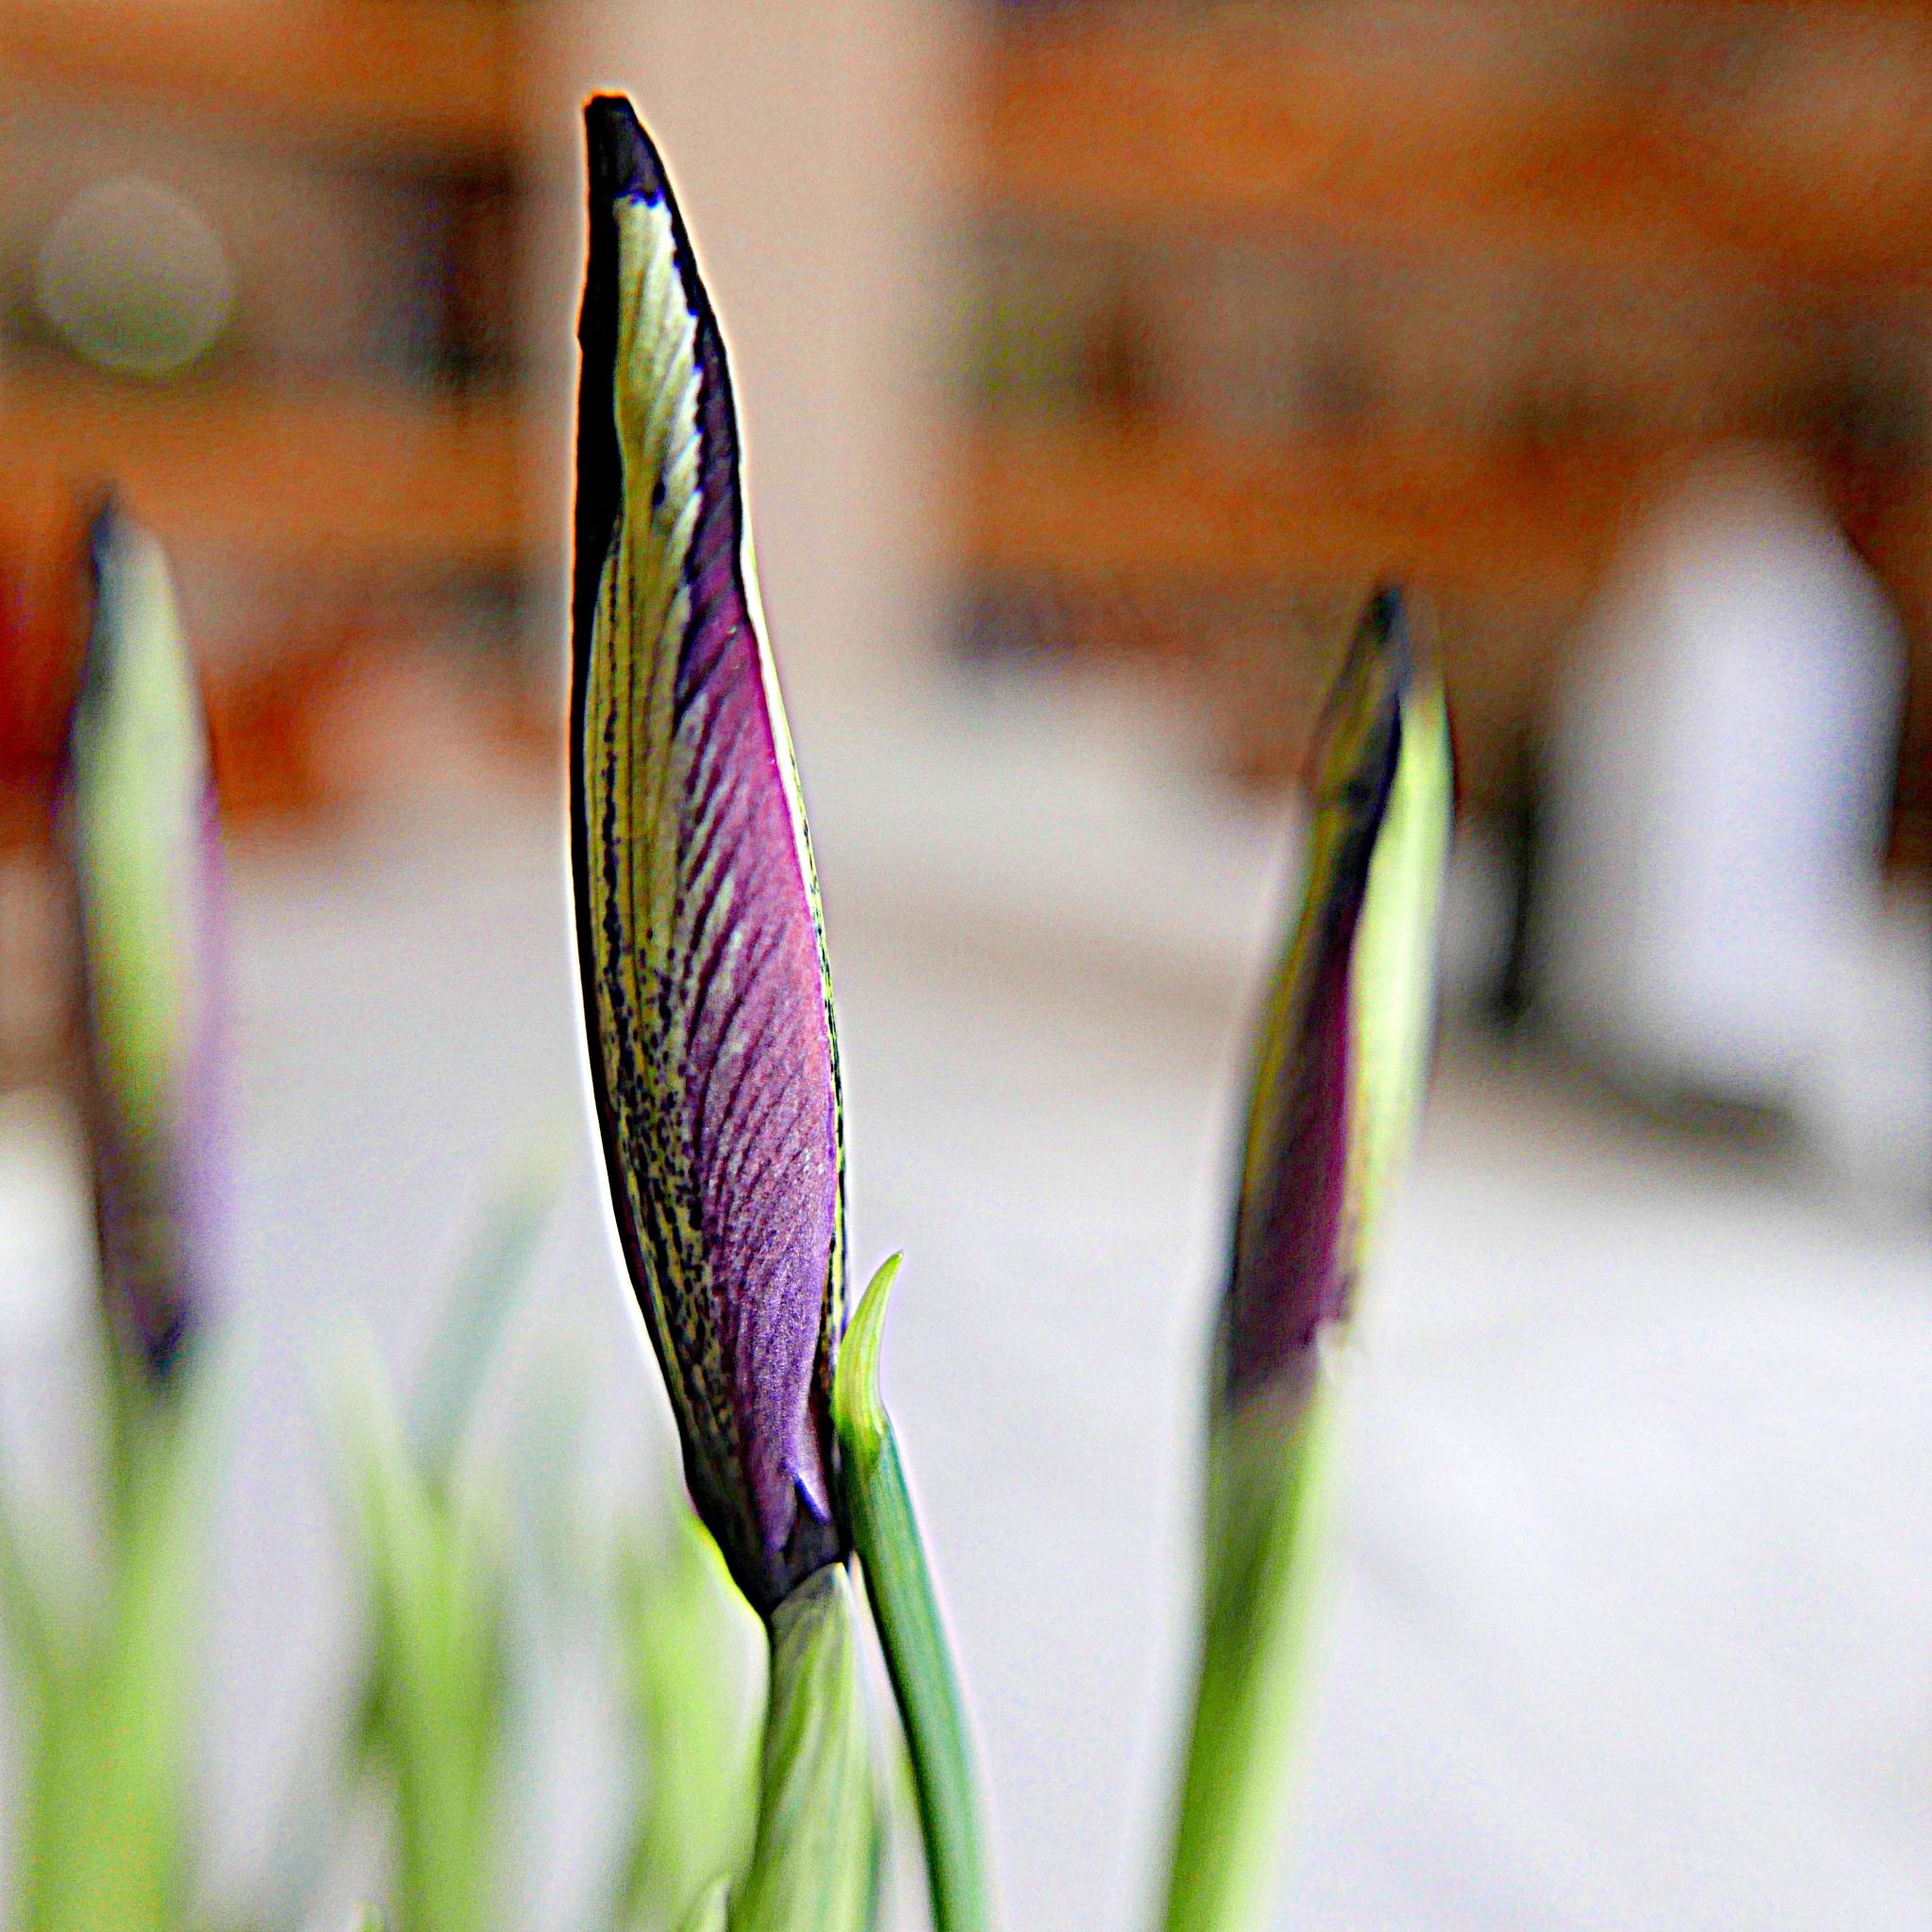 bouton d'iris by Mina Elvé